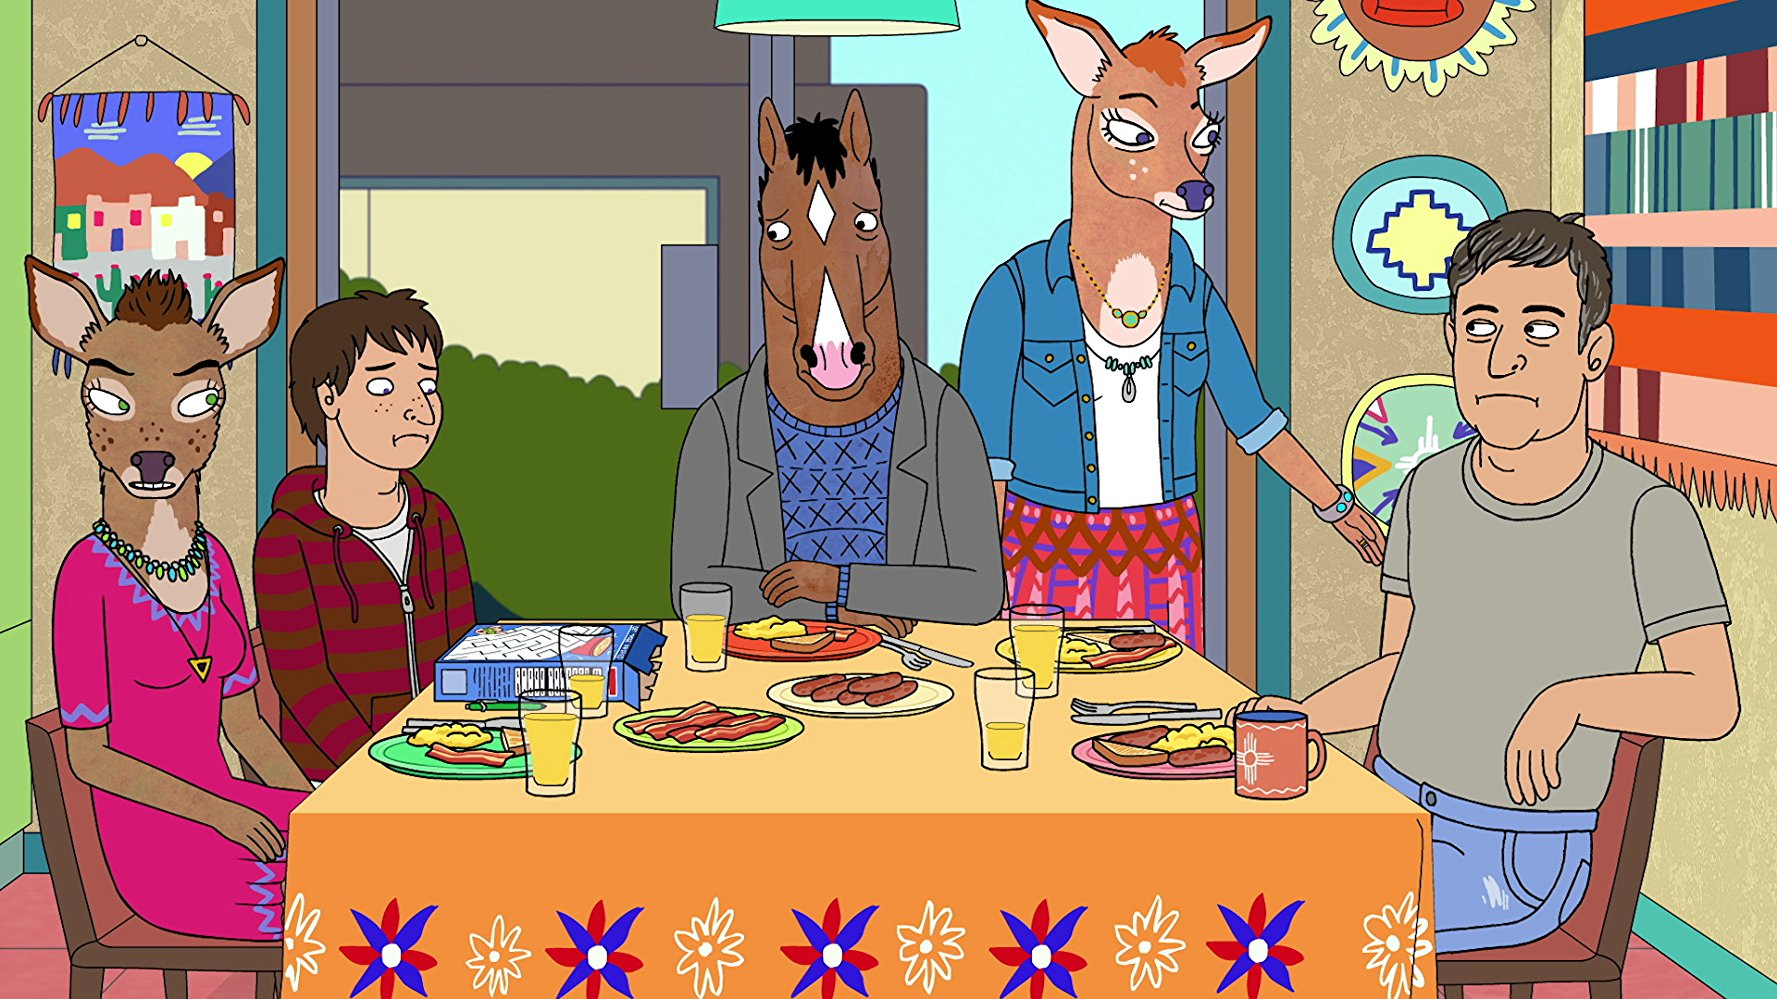 BoJack Horseman - Season 4